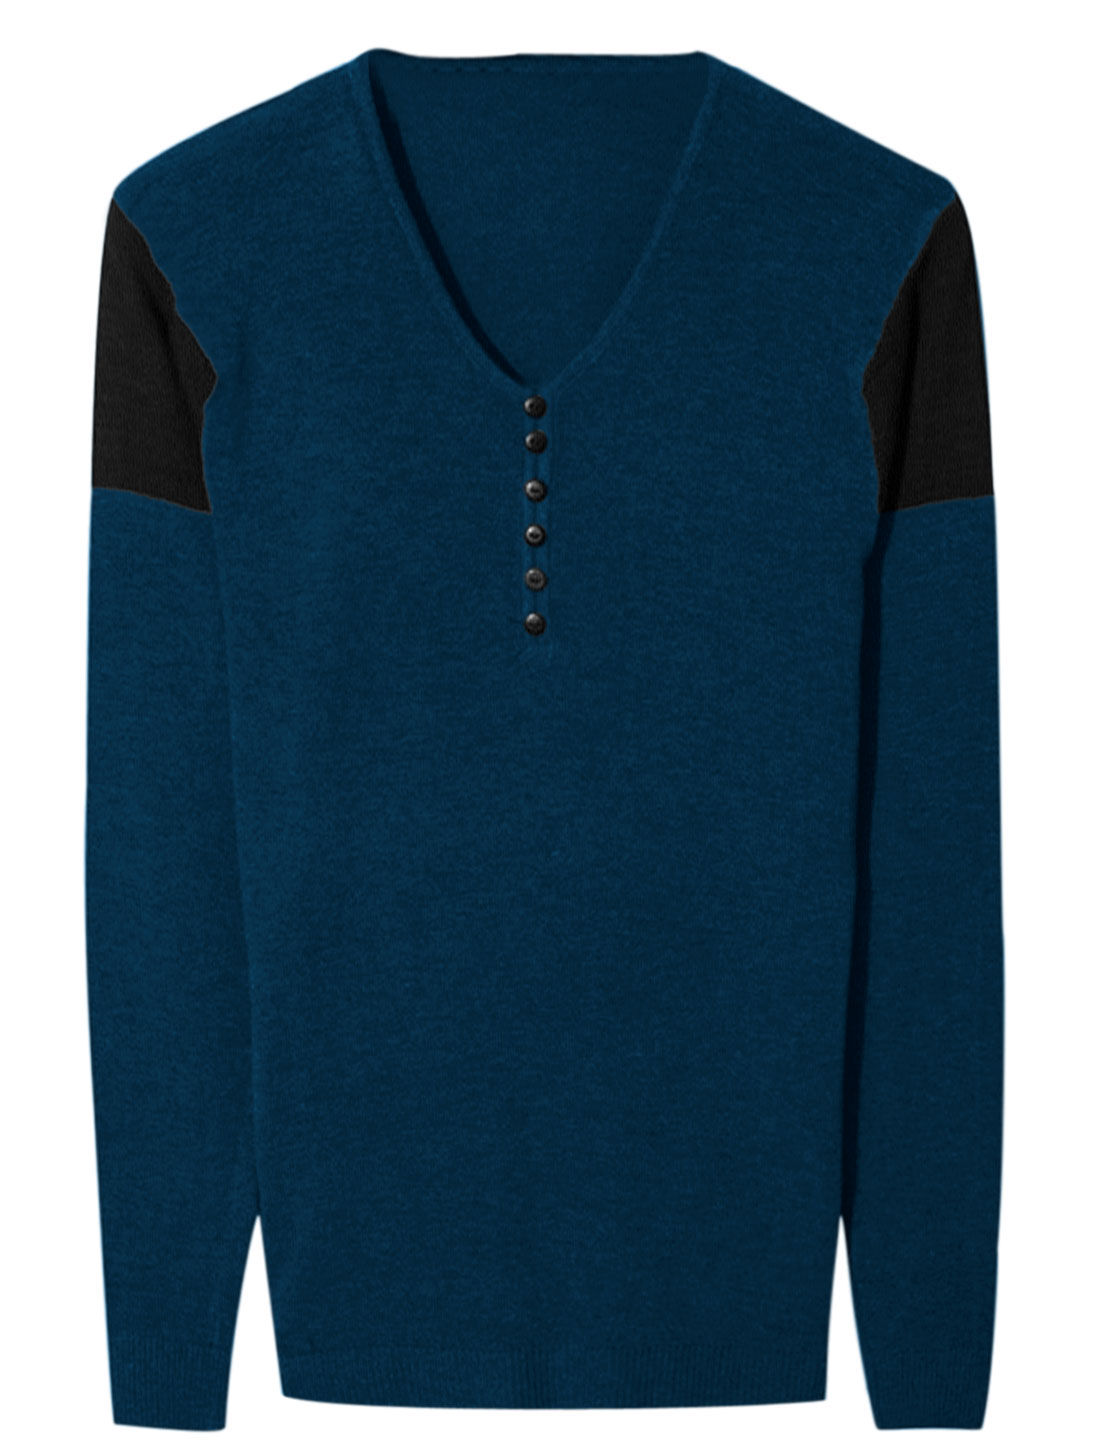 Men V Neck Buttons Decor Colorblock Pullover Knit Shirt Navy Blue S